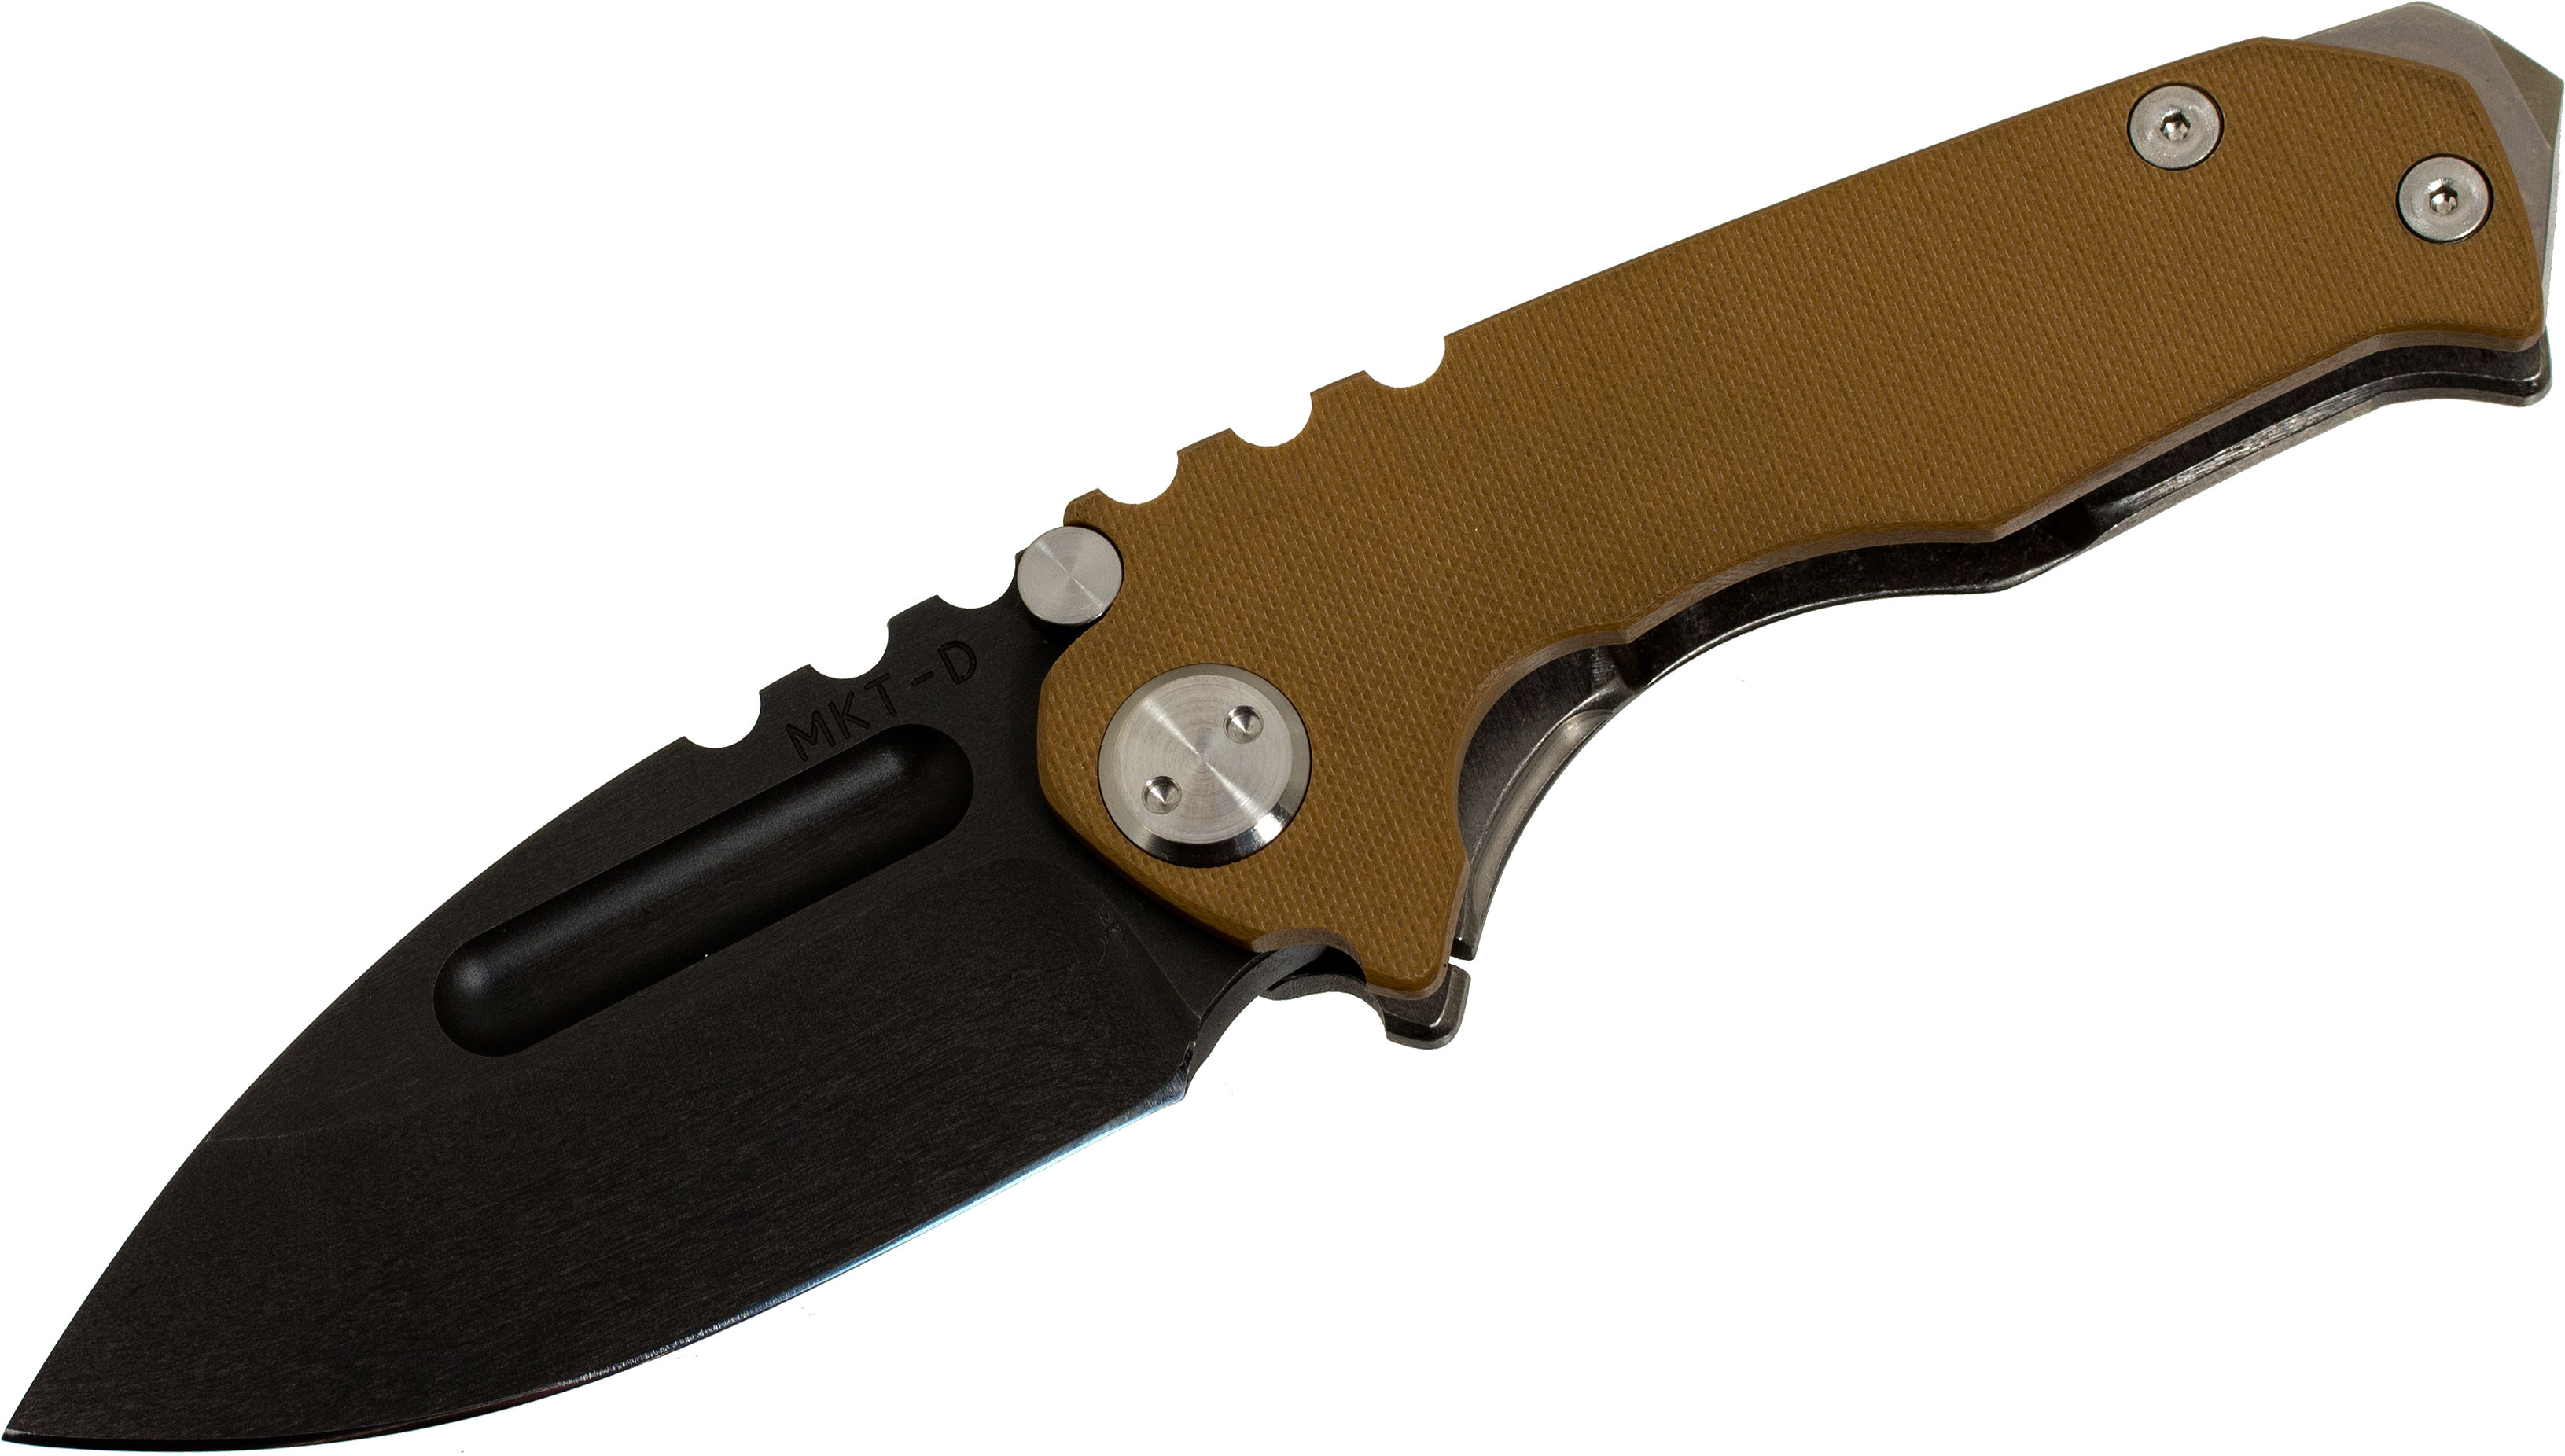 Medford Micro Praetorian Folder 2.8 inch Black D2 Plain Blade, Coyote Brown G10/Tumbled Titanium Handles